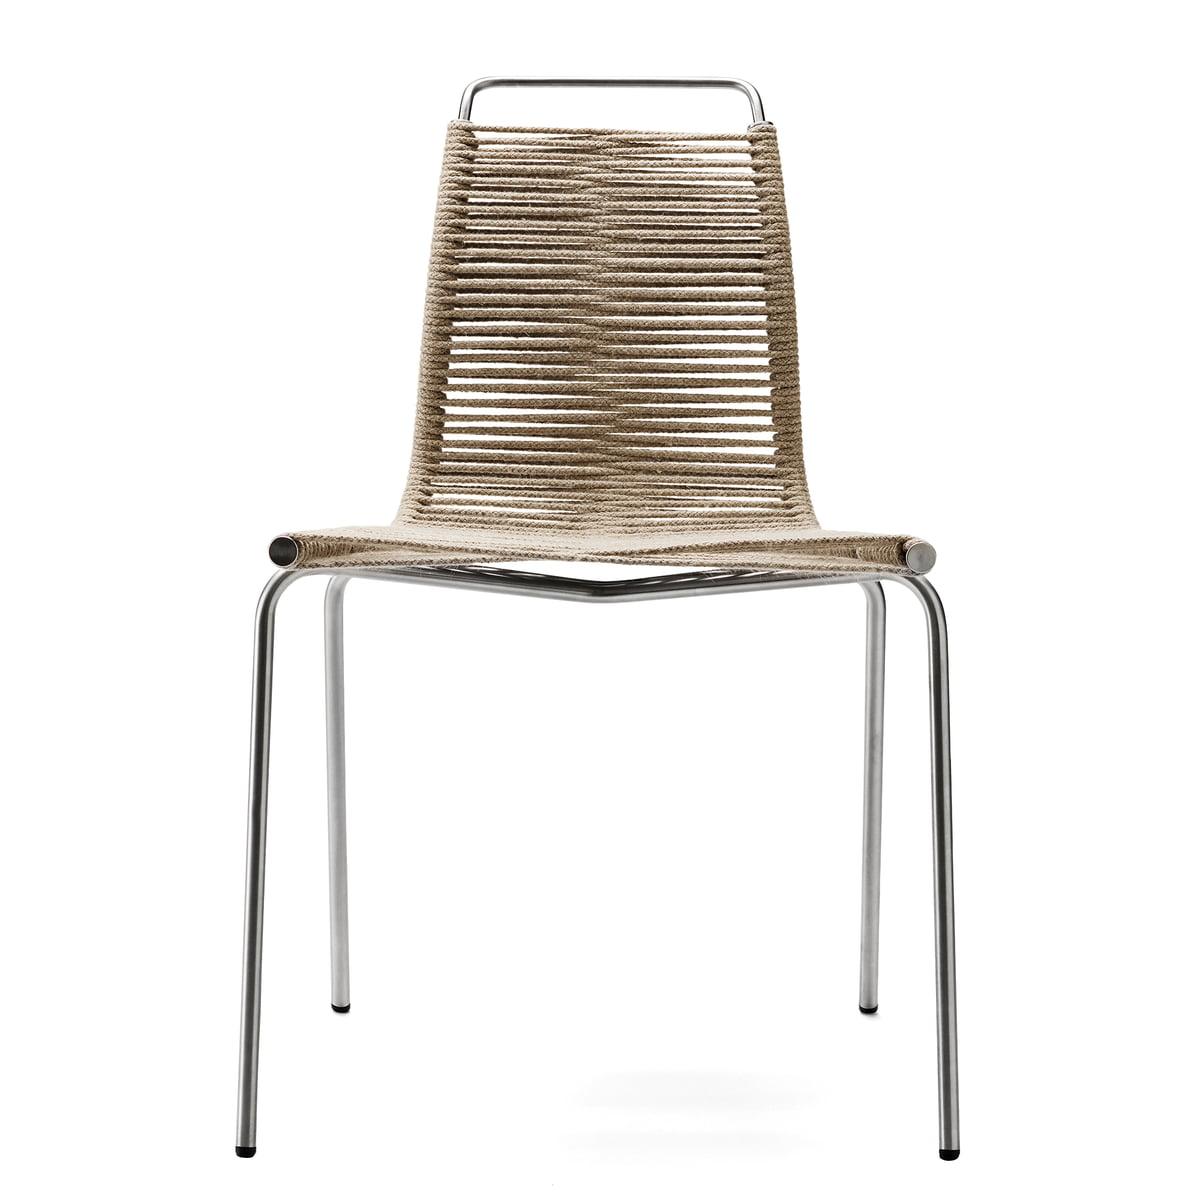 Carl Hansen Pk1 Indoor Chair Chrome Plated Steel Nature Halyard